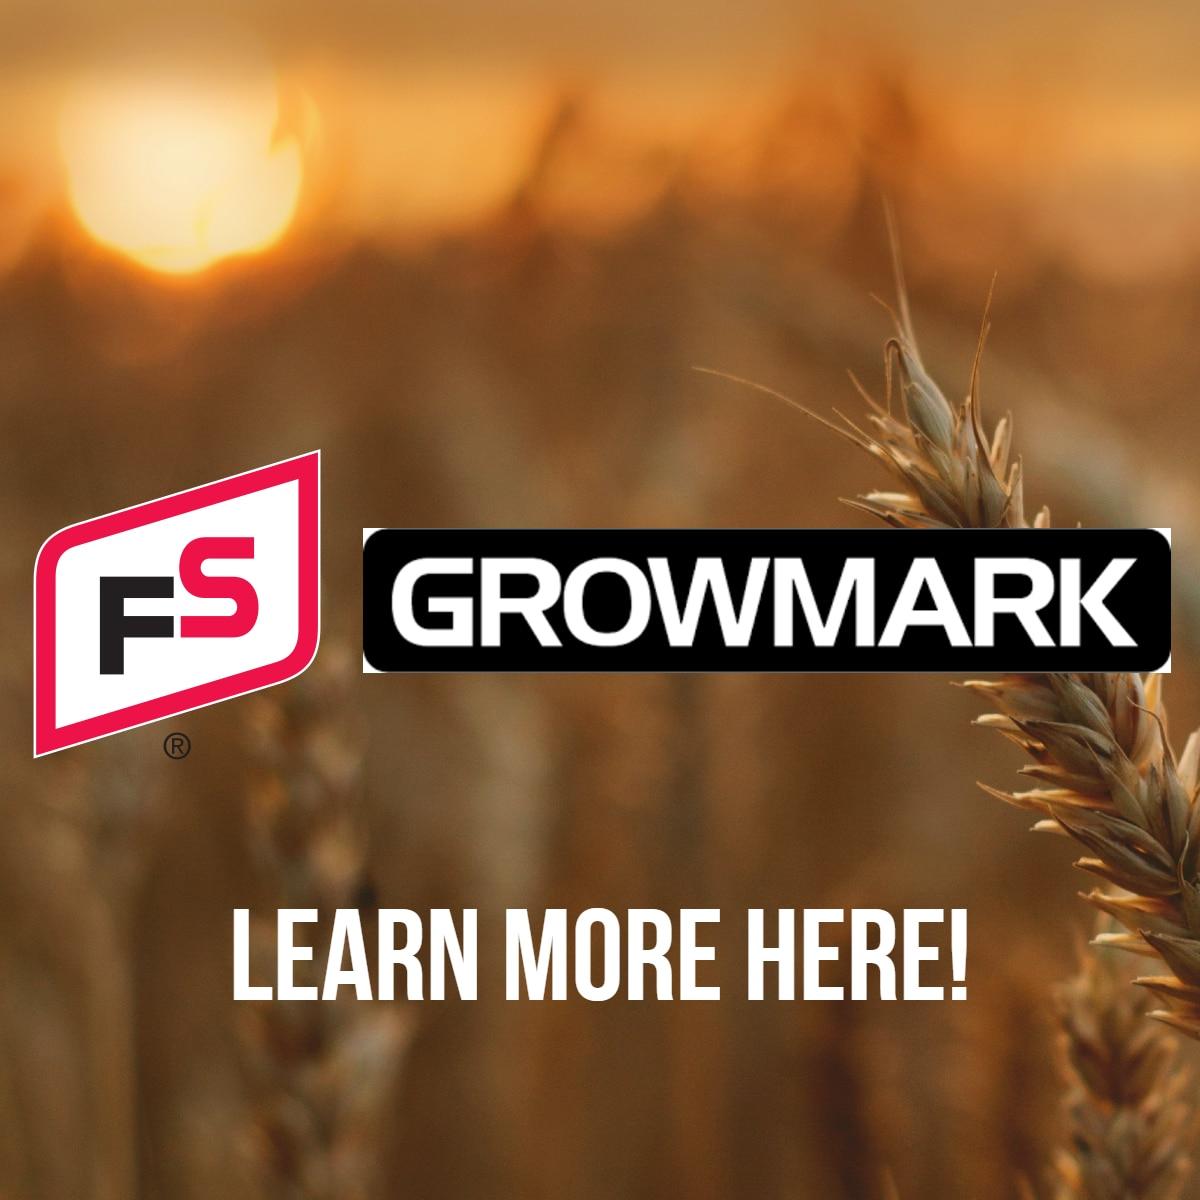 fs-growmark-300×300-1